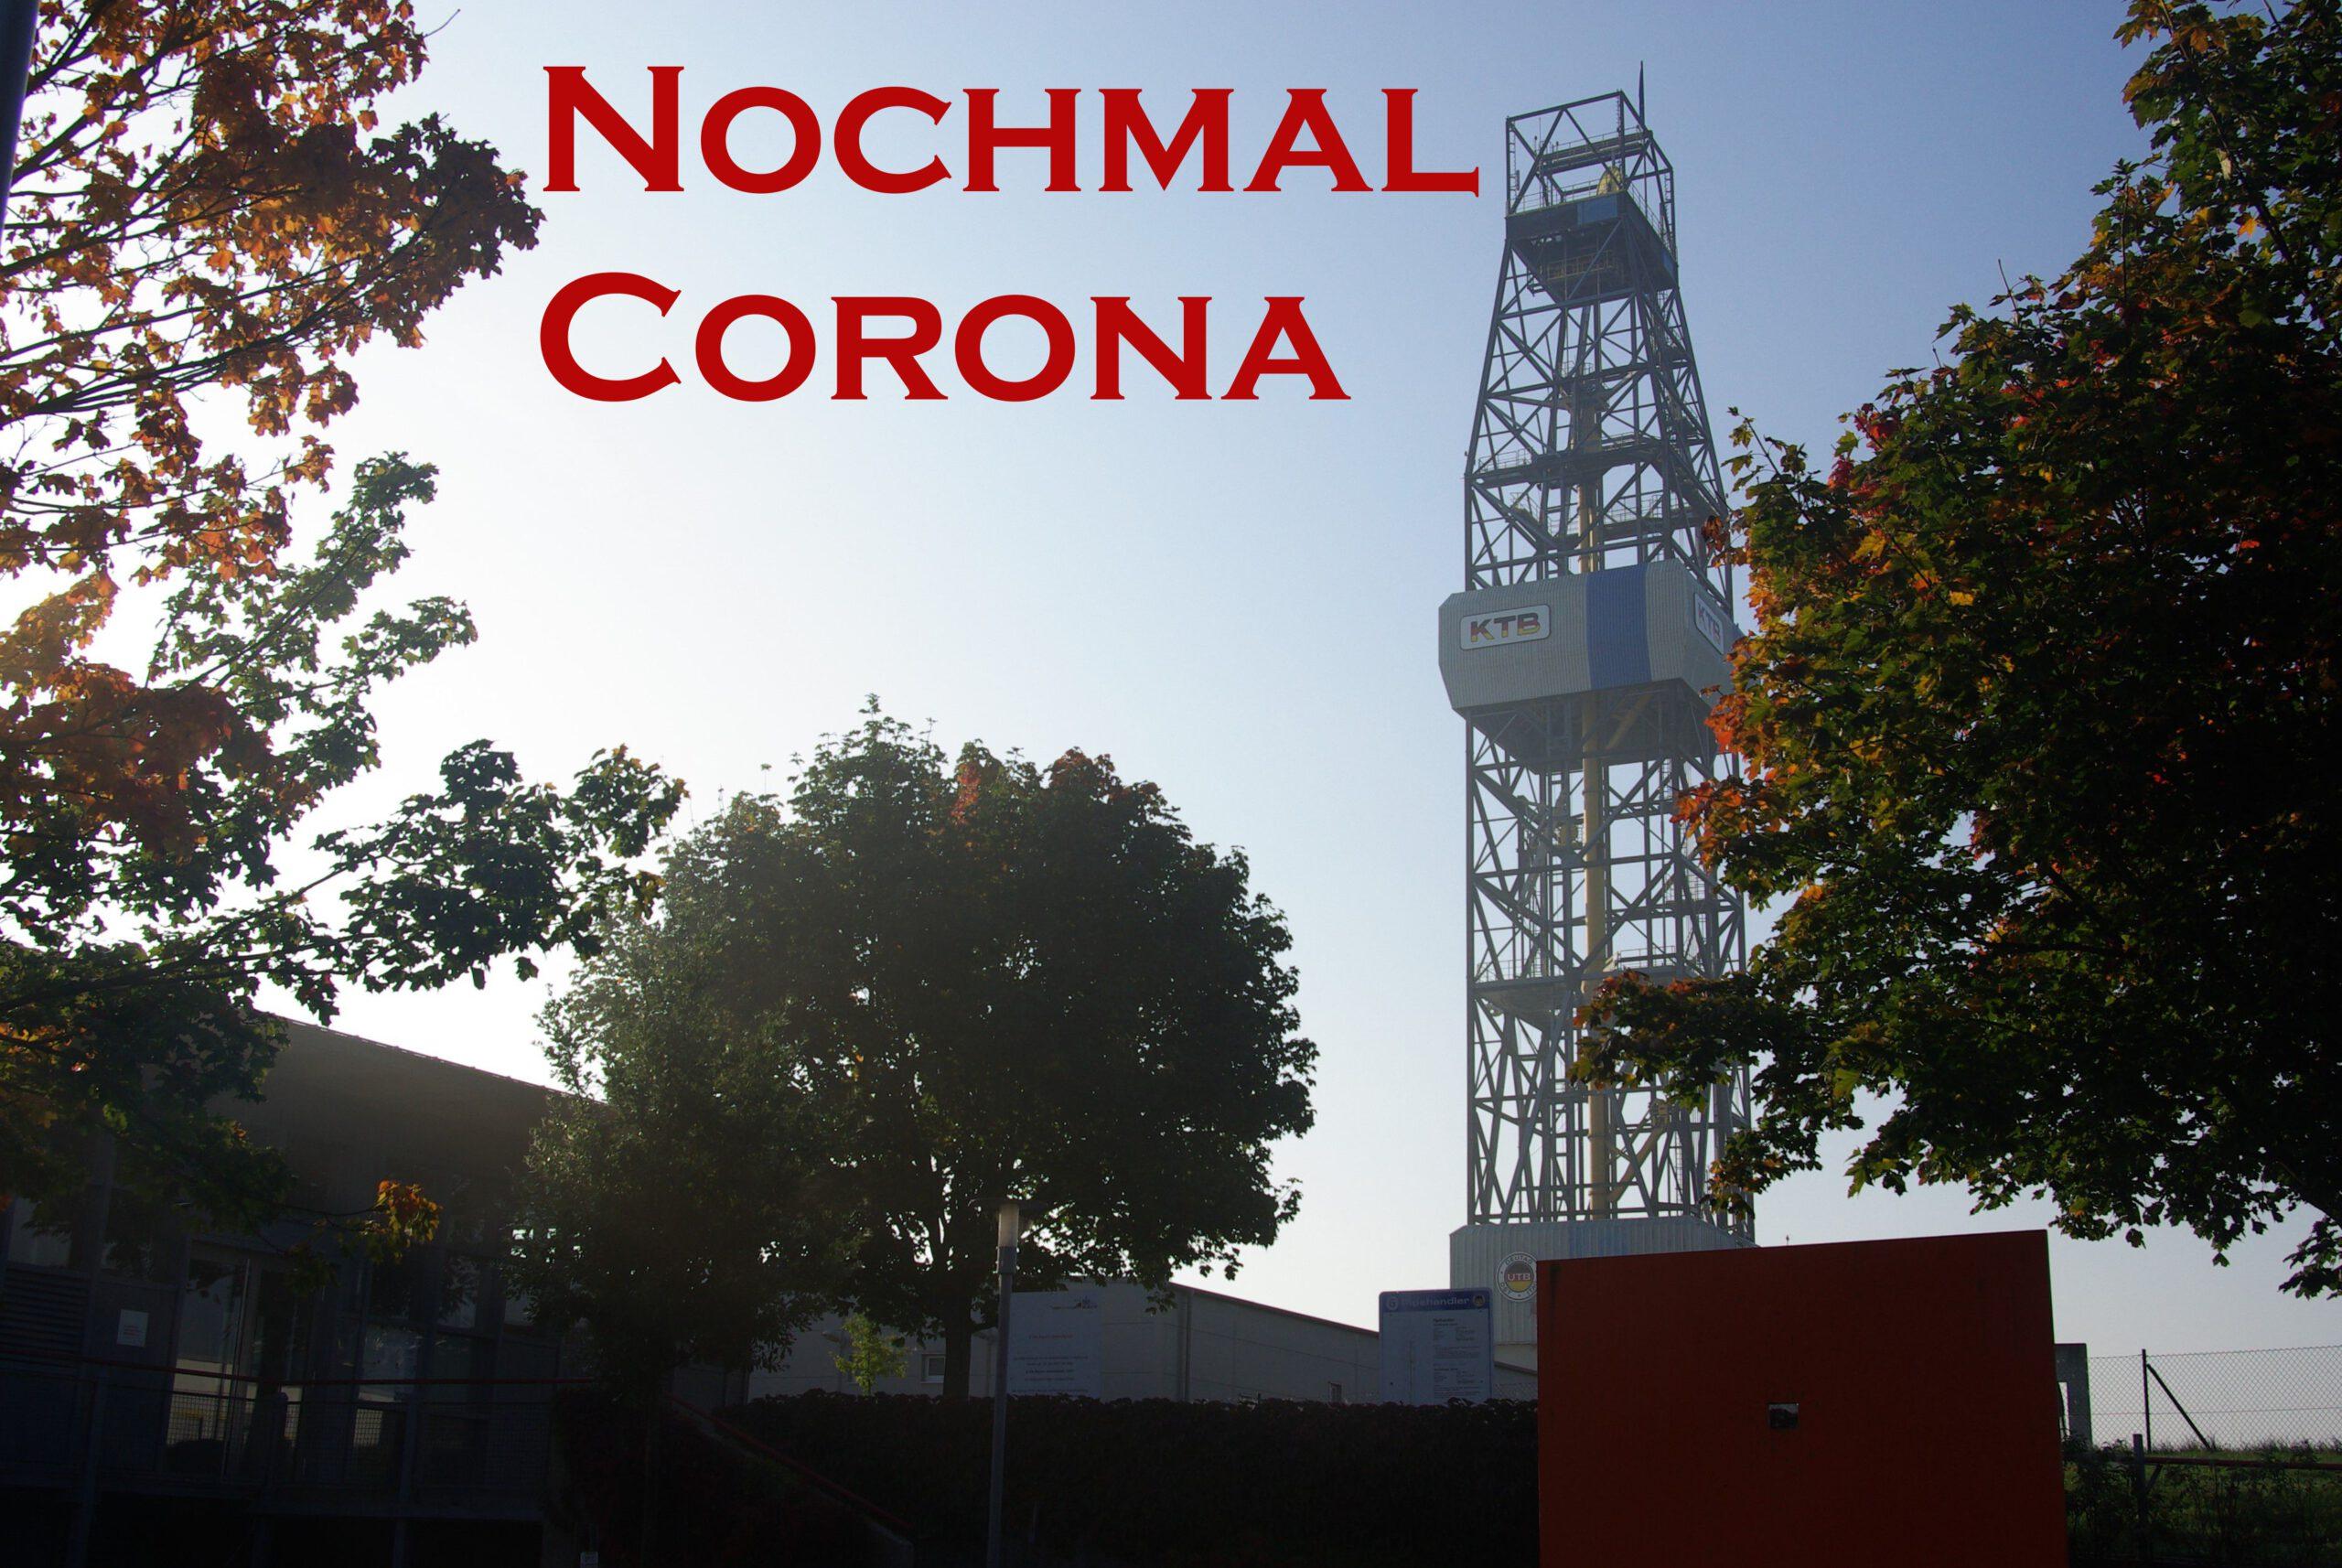 Nochmal Corona